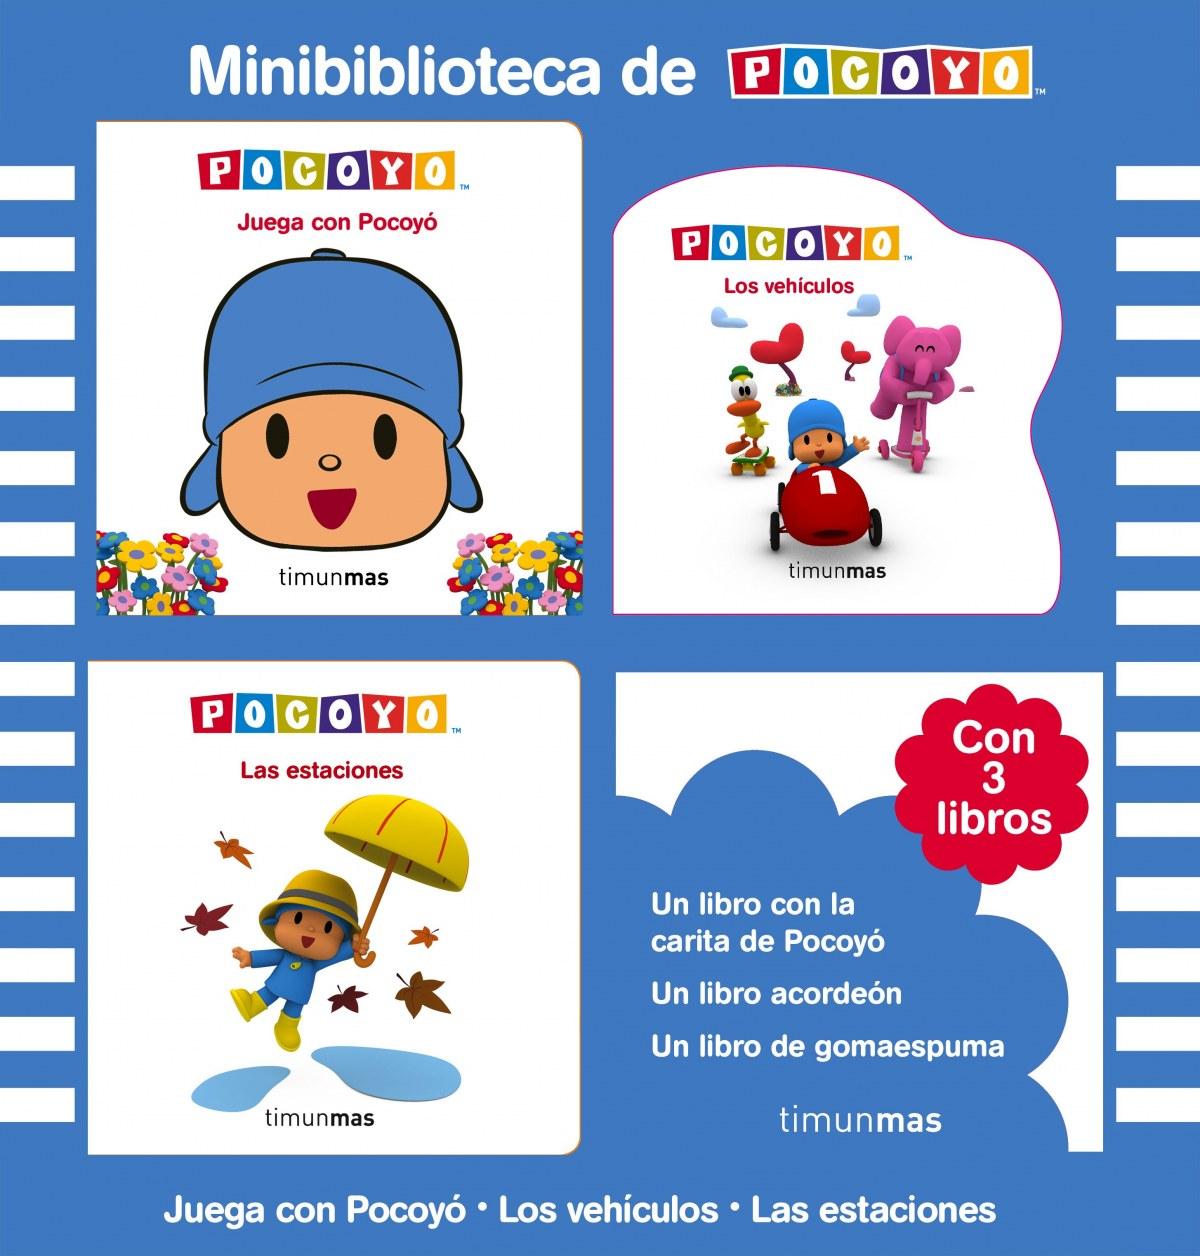 Minibiblioteca de Pocoyó